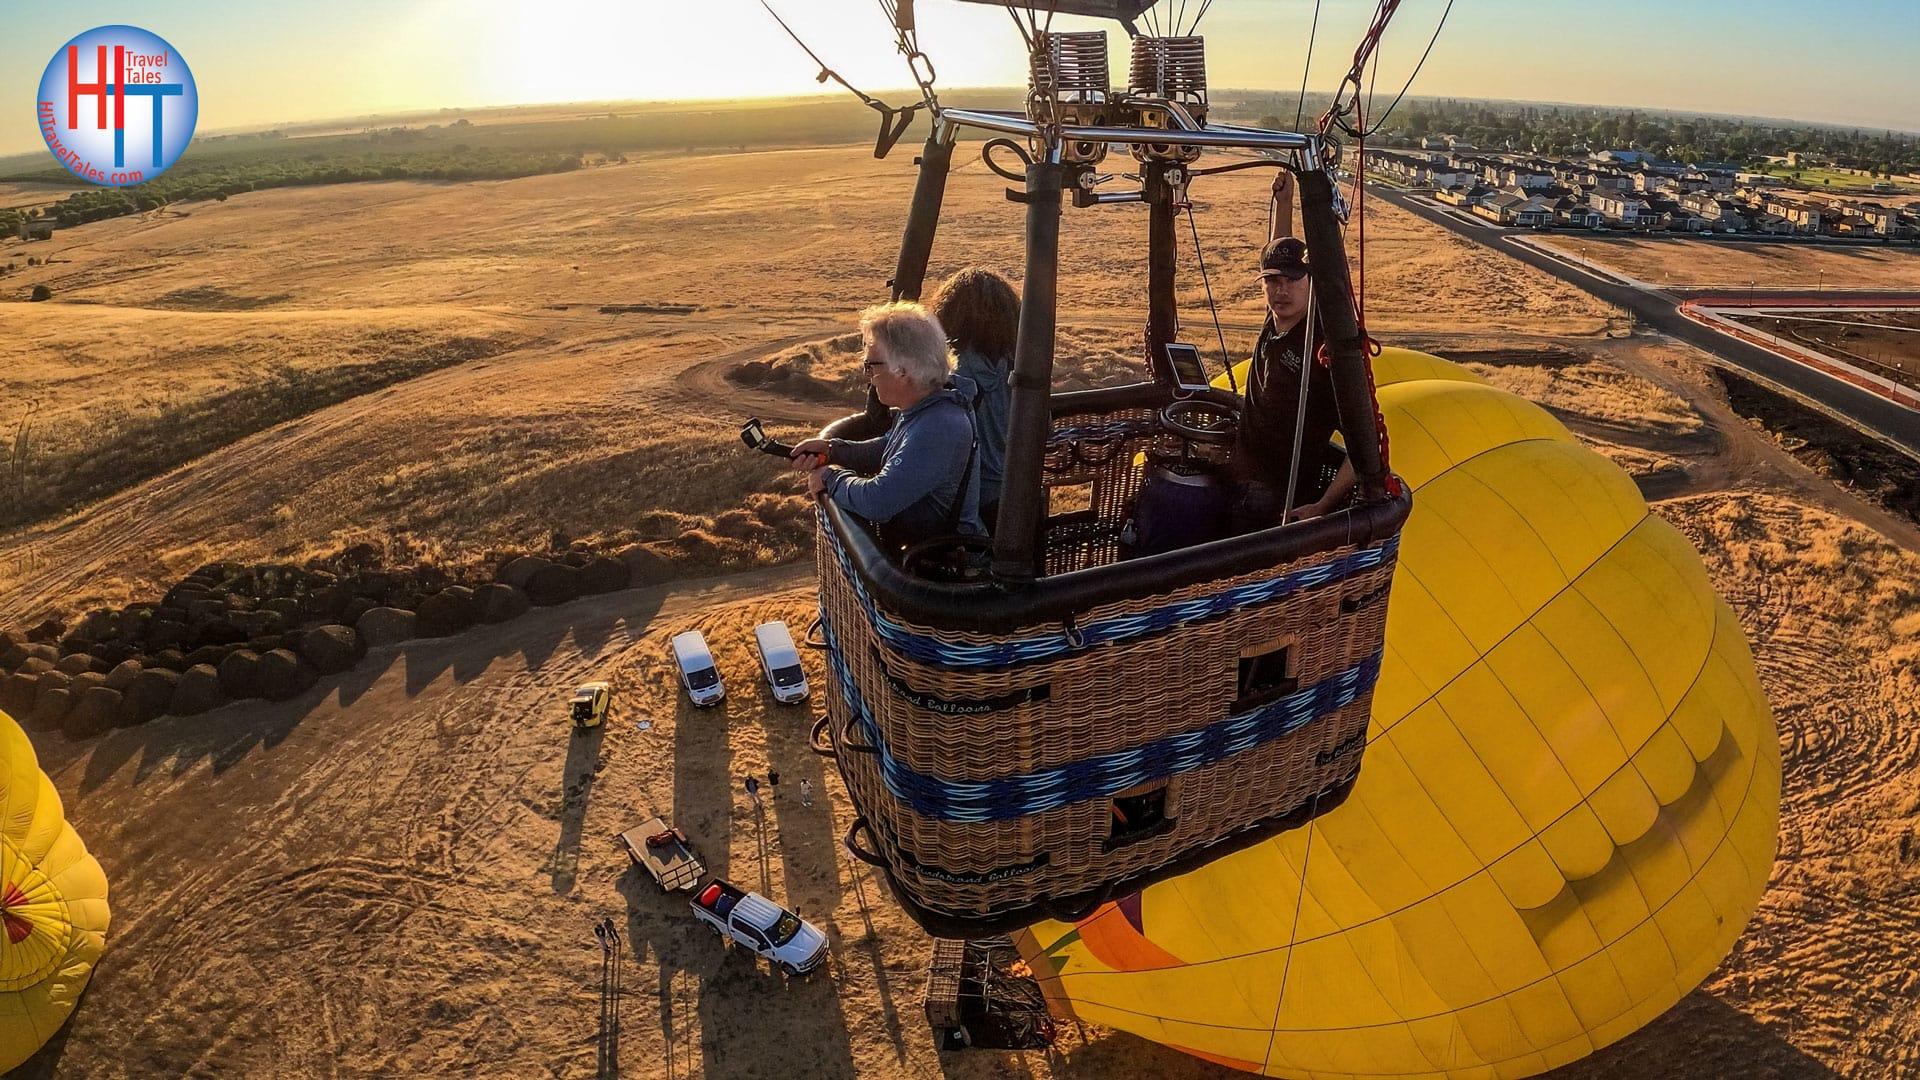 Yolo Ballooning Adventures Takeoff Group Selfie